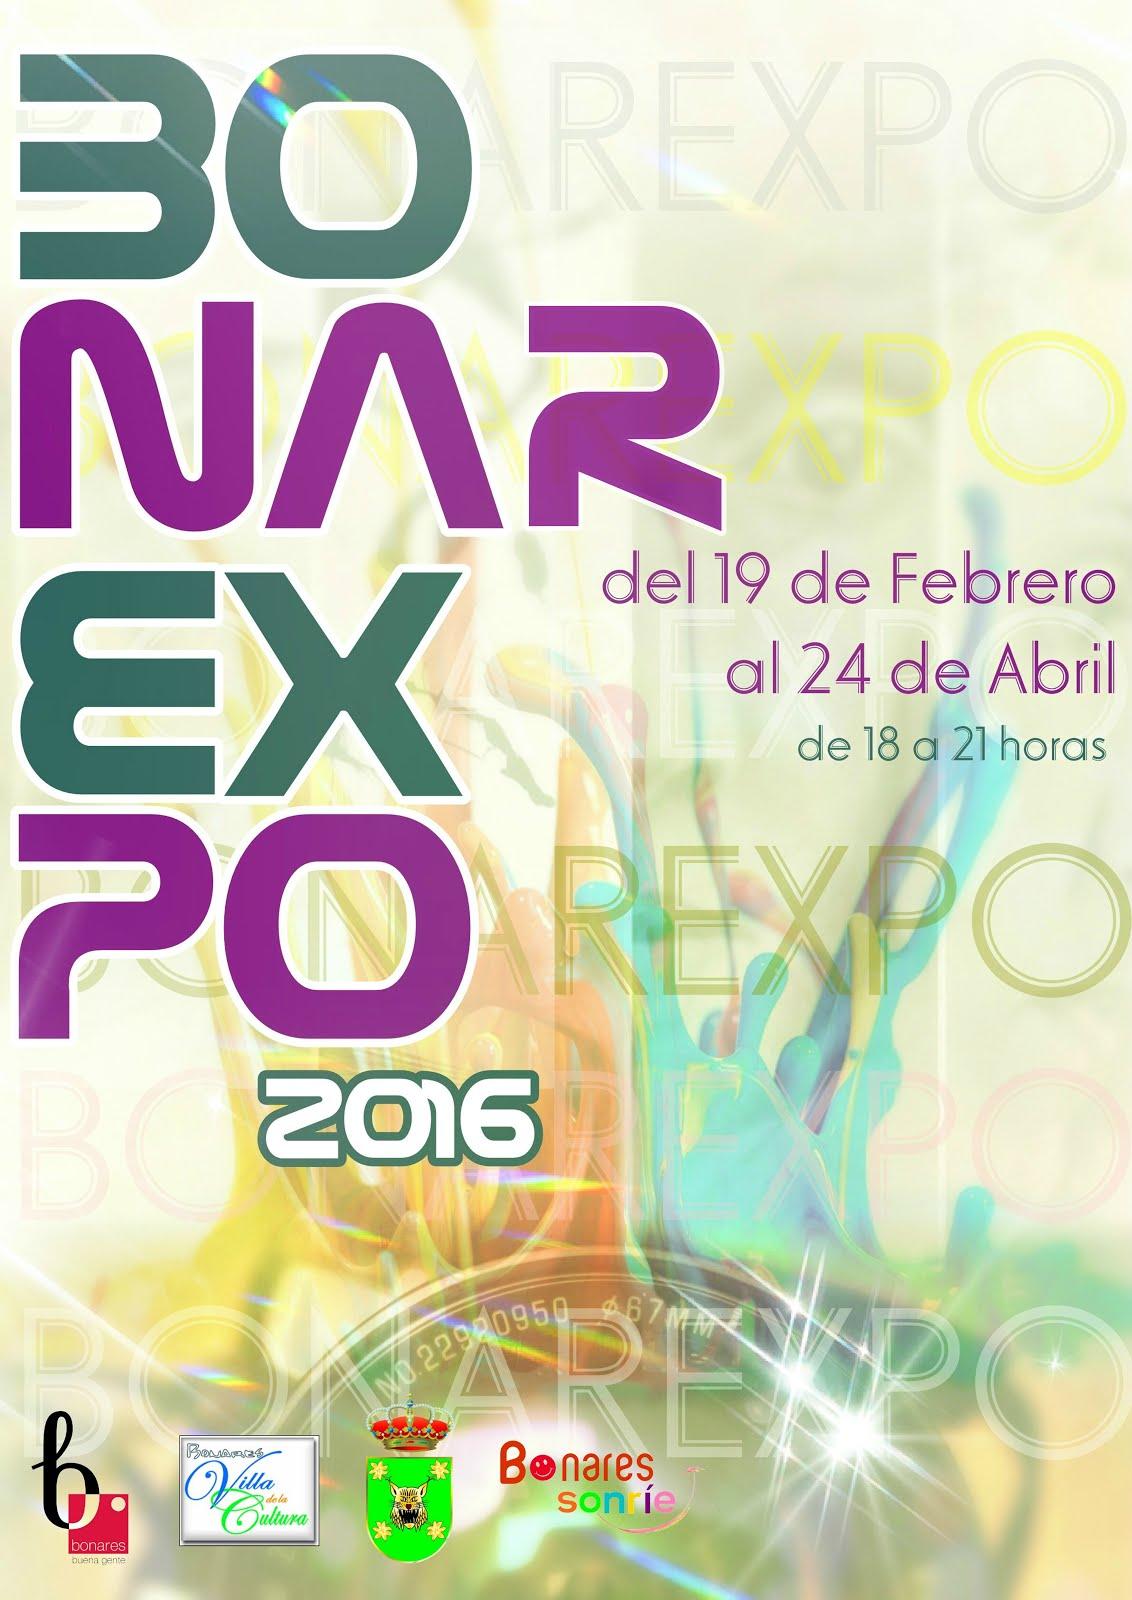 BONAREXPO 2016 - CARTEL